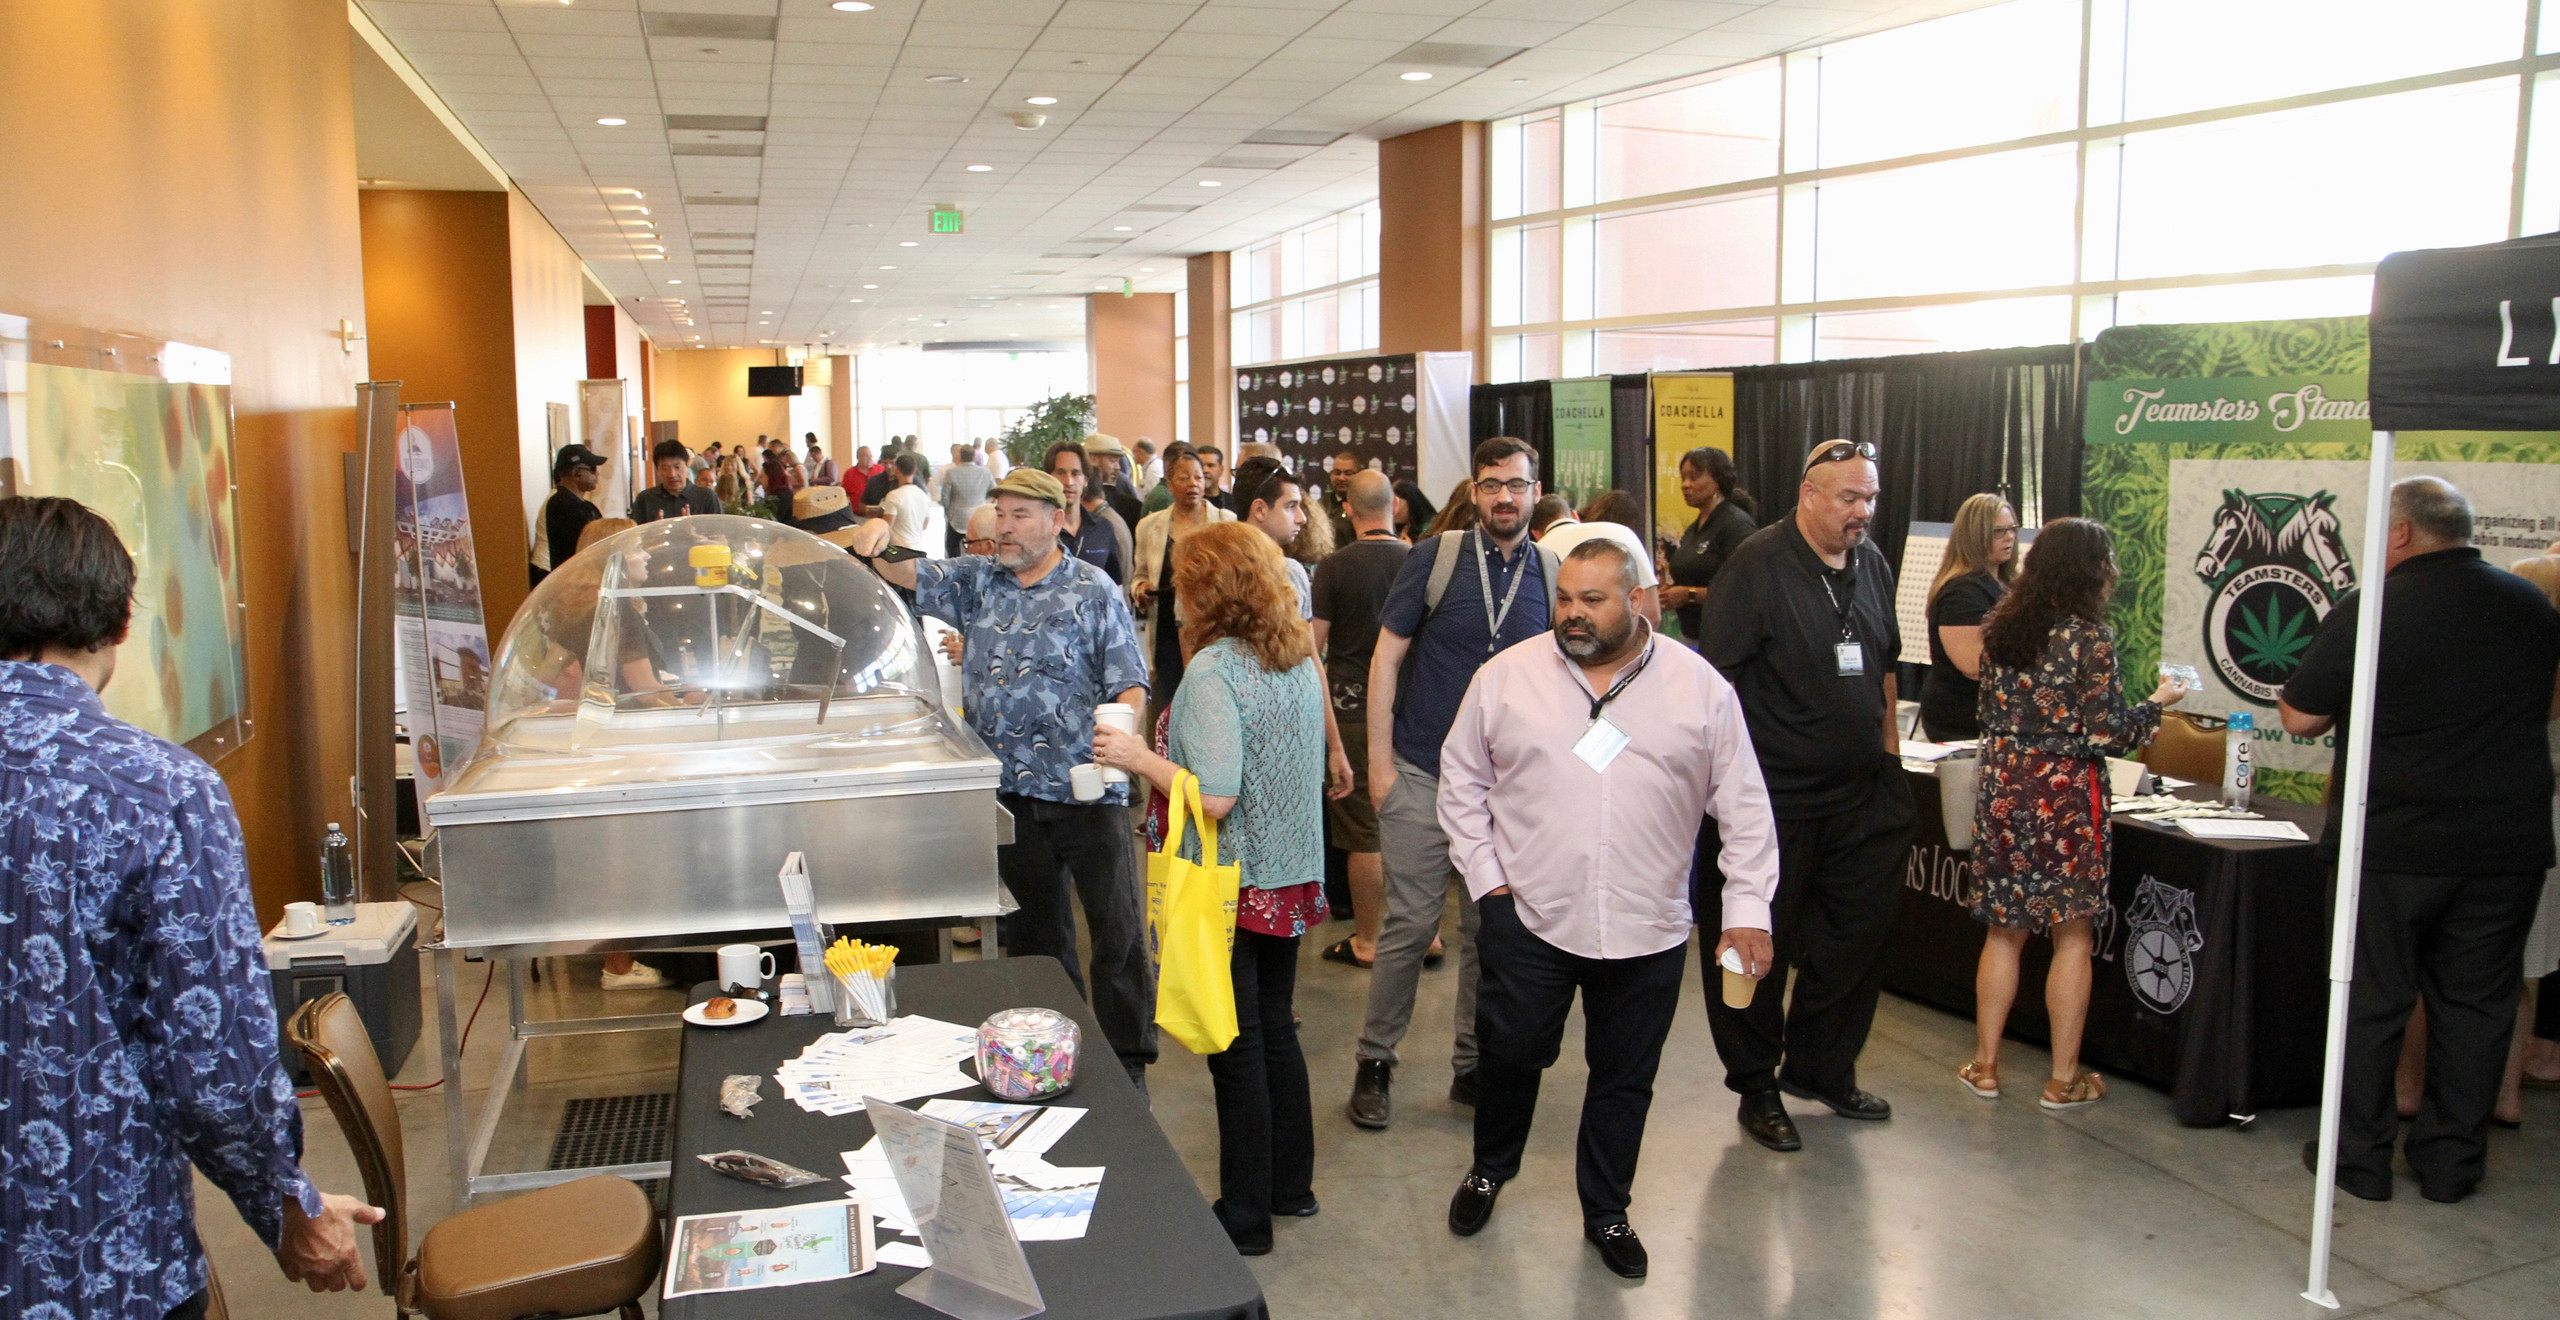 Summit Lobby with Exhibitors